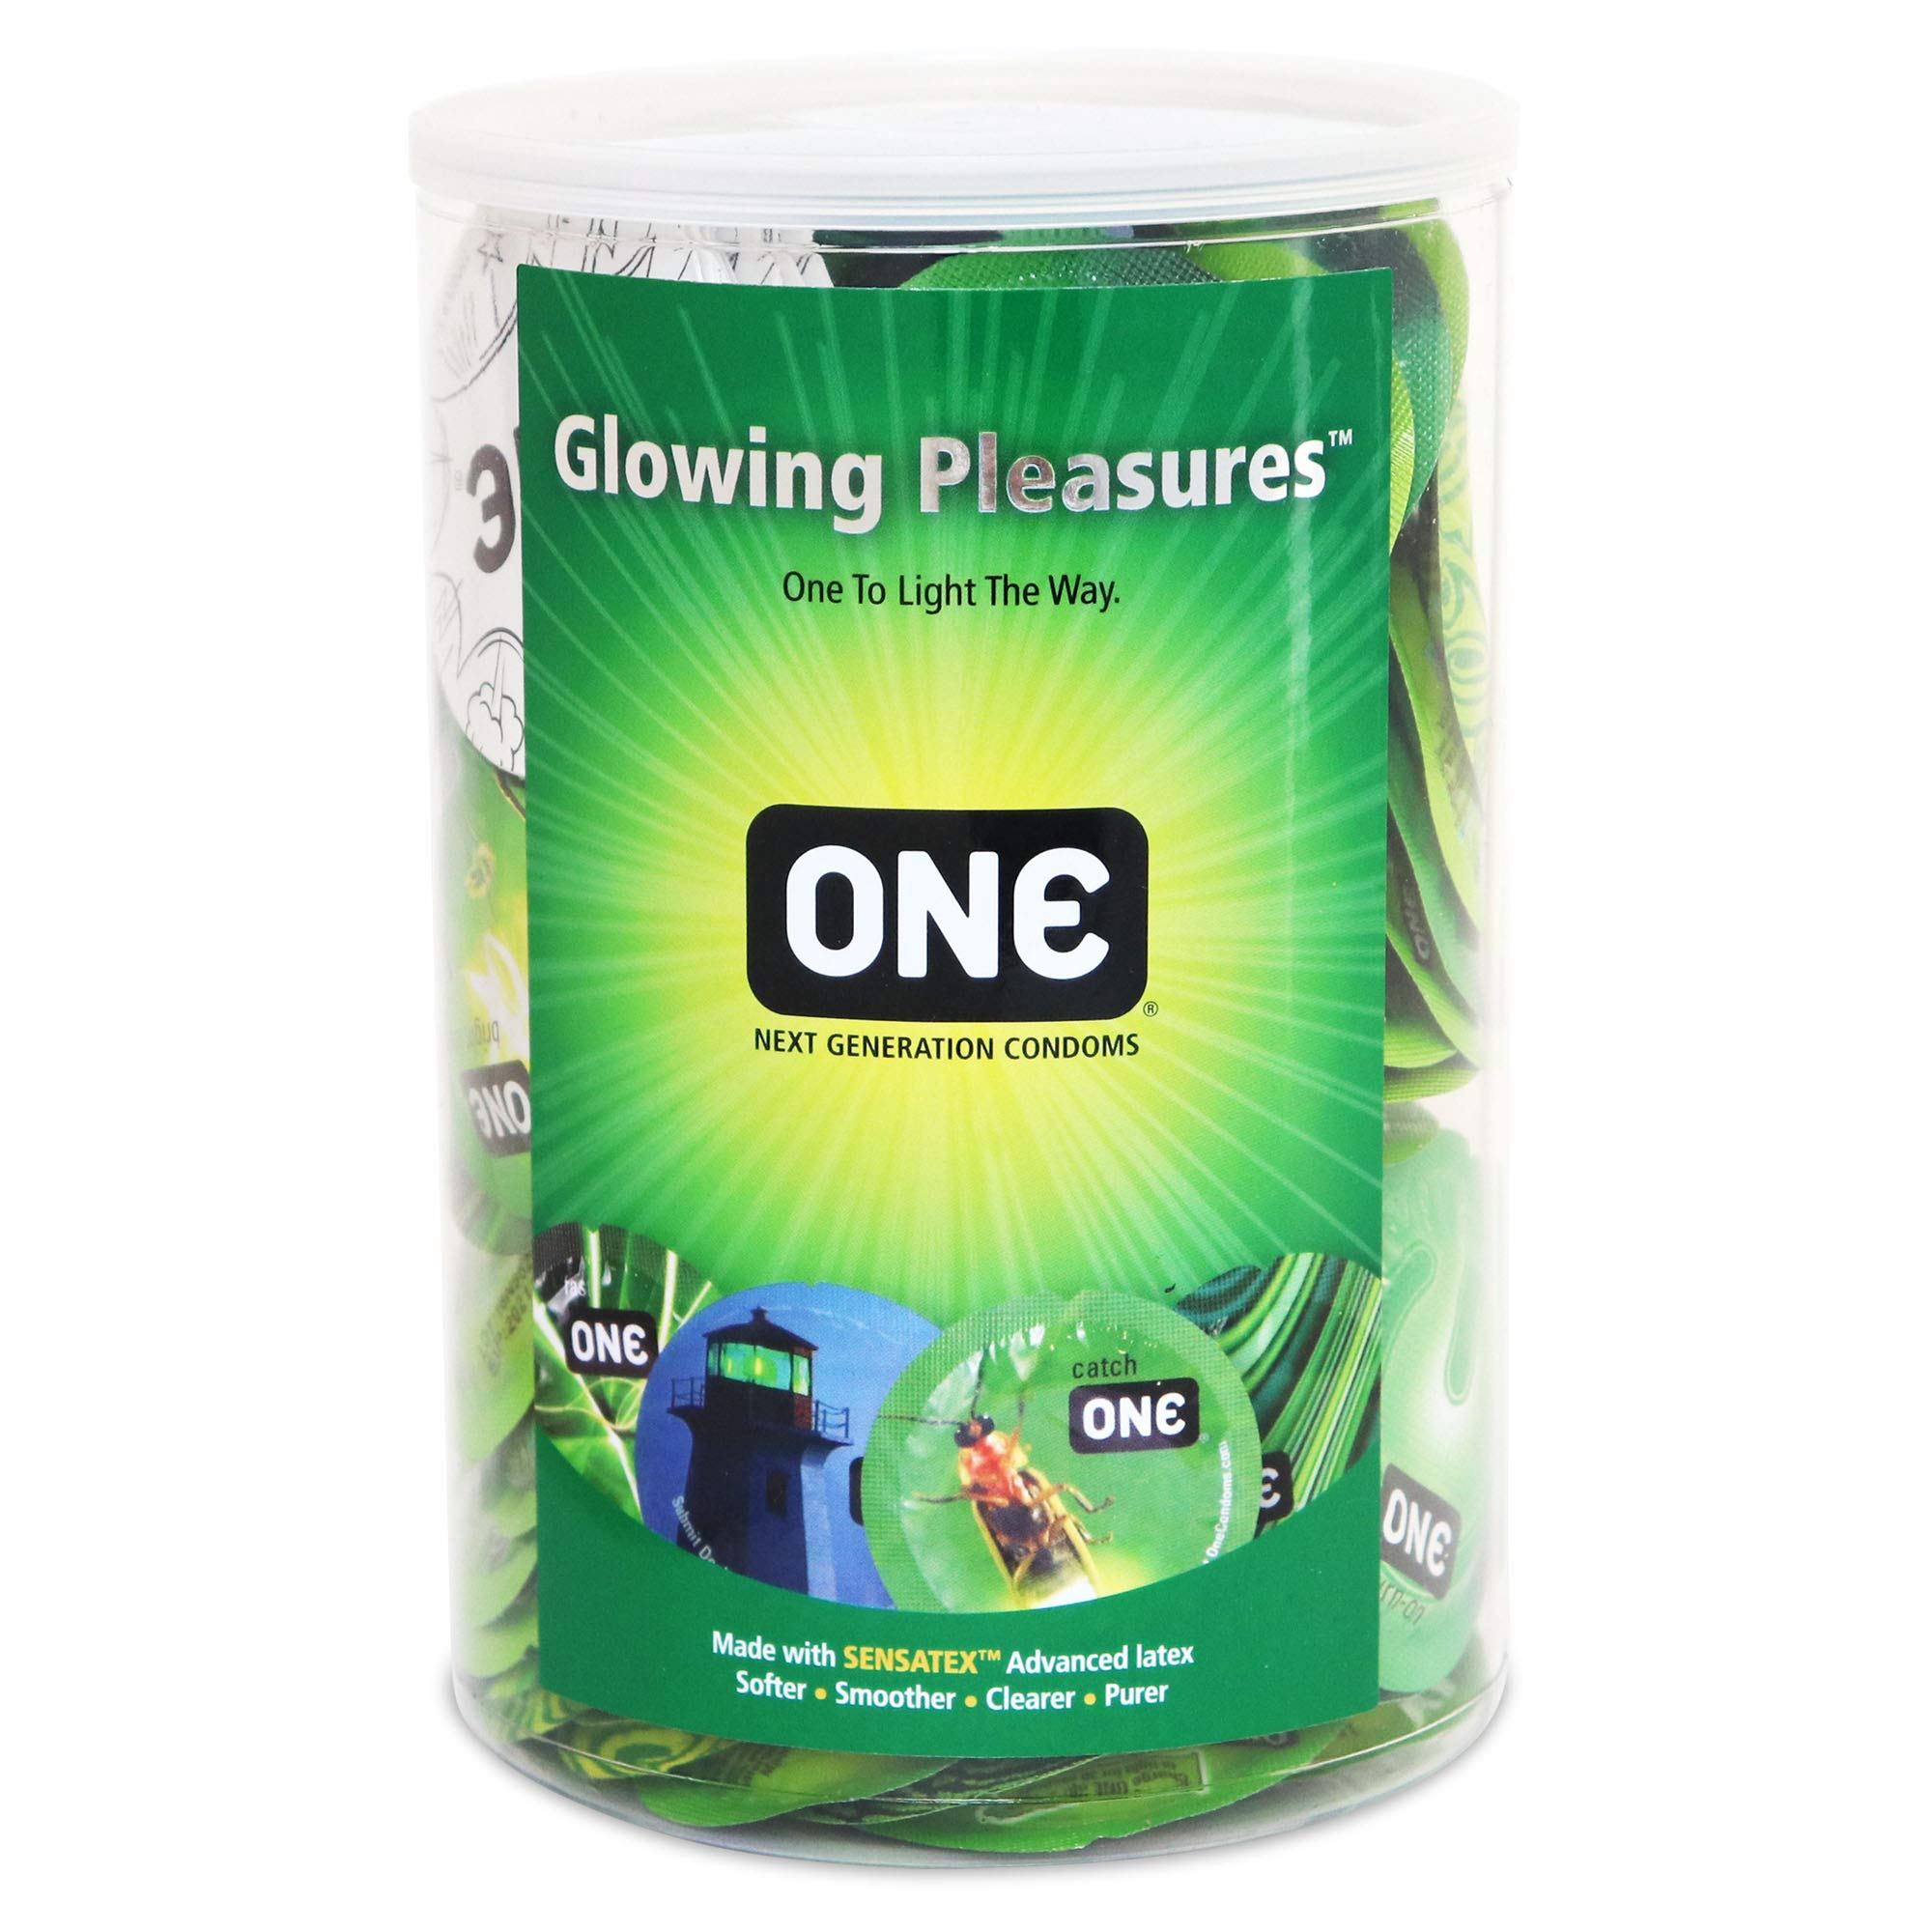 ONE Glowing Pleasures Glow-in-The-Dark Condoms-100 Count Display Bowl by ONE, Lunamax